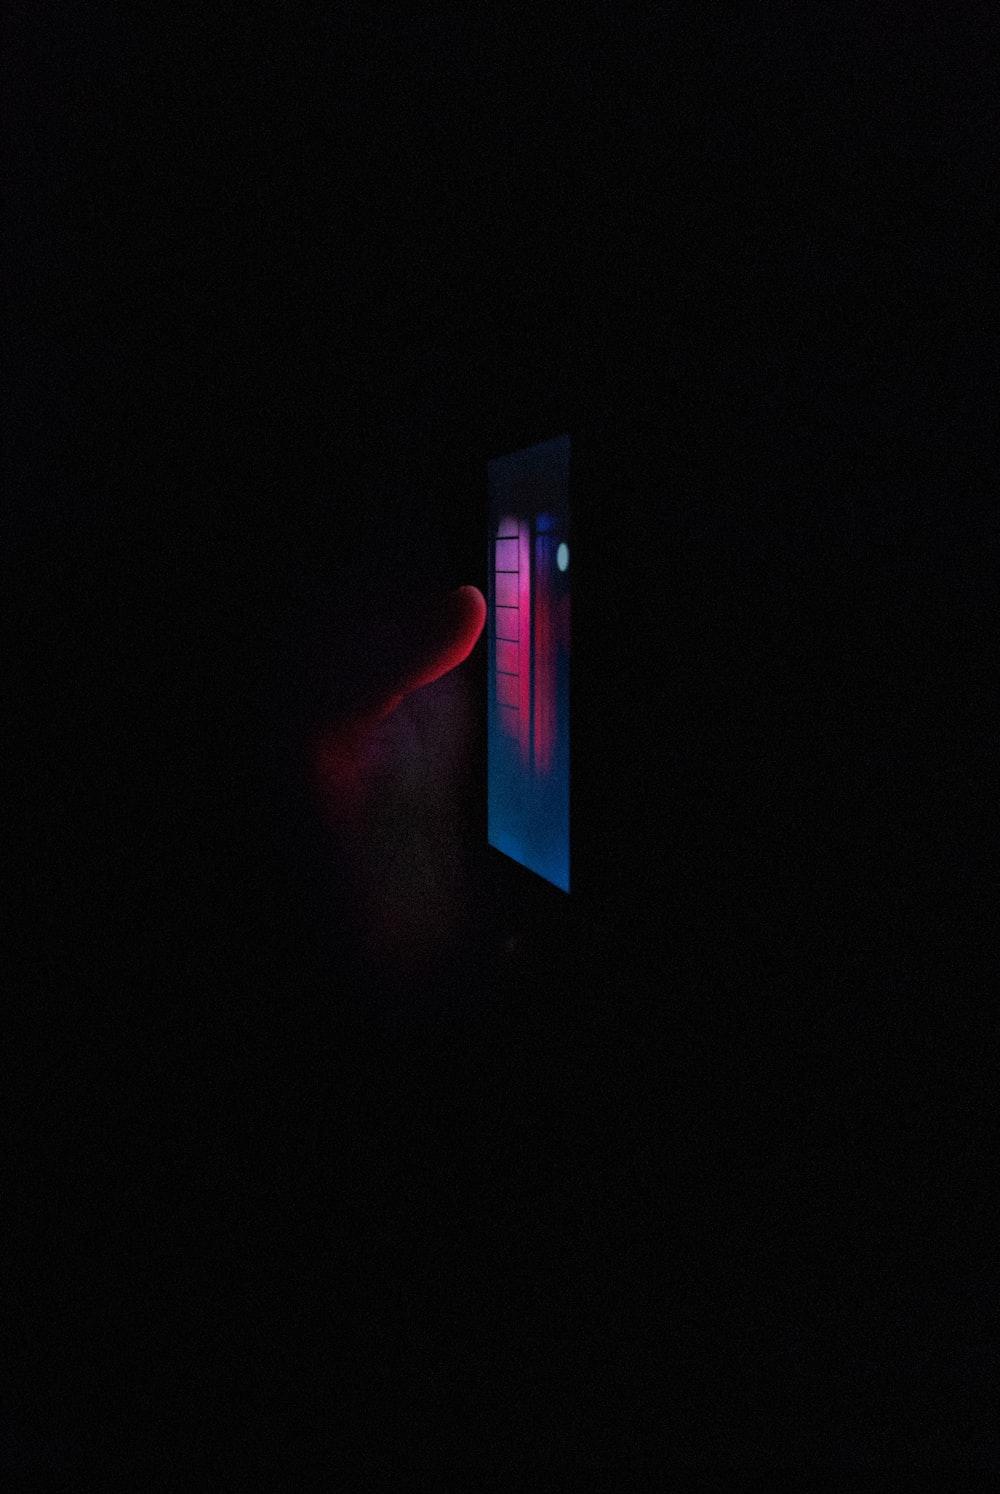 black flat screen tv turned on in dark room